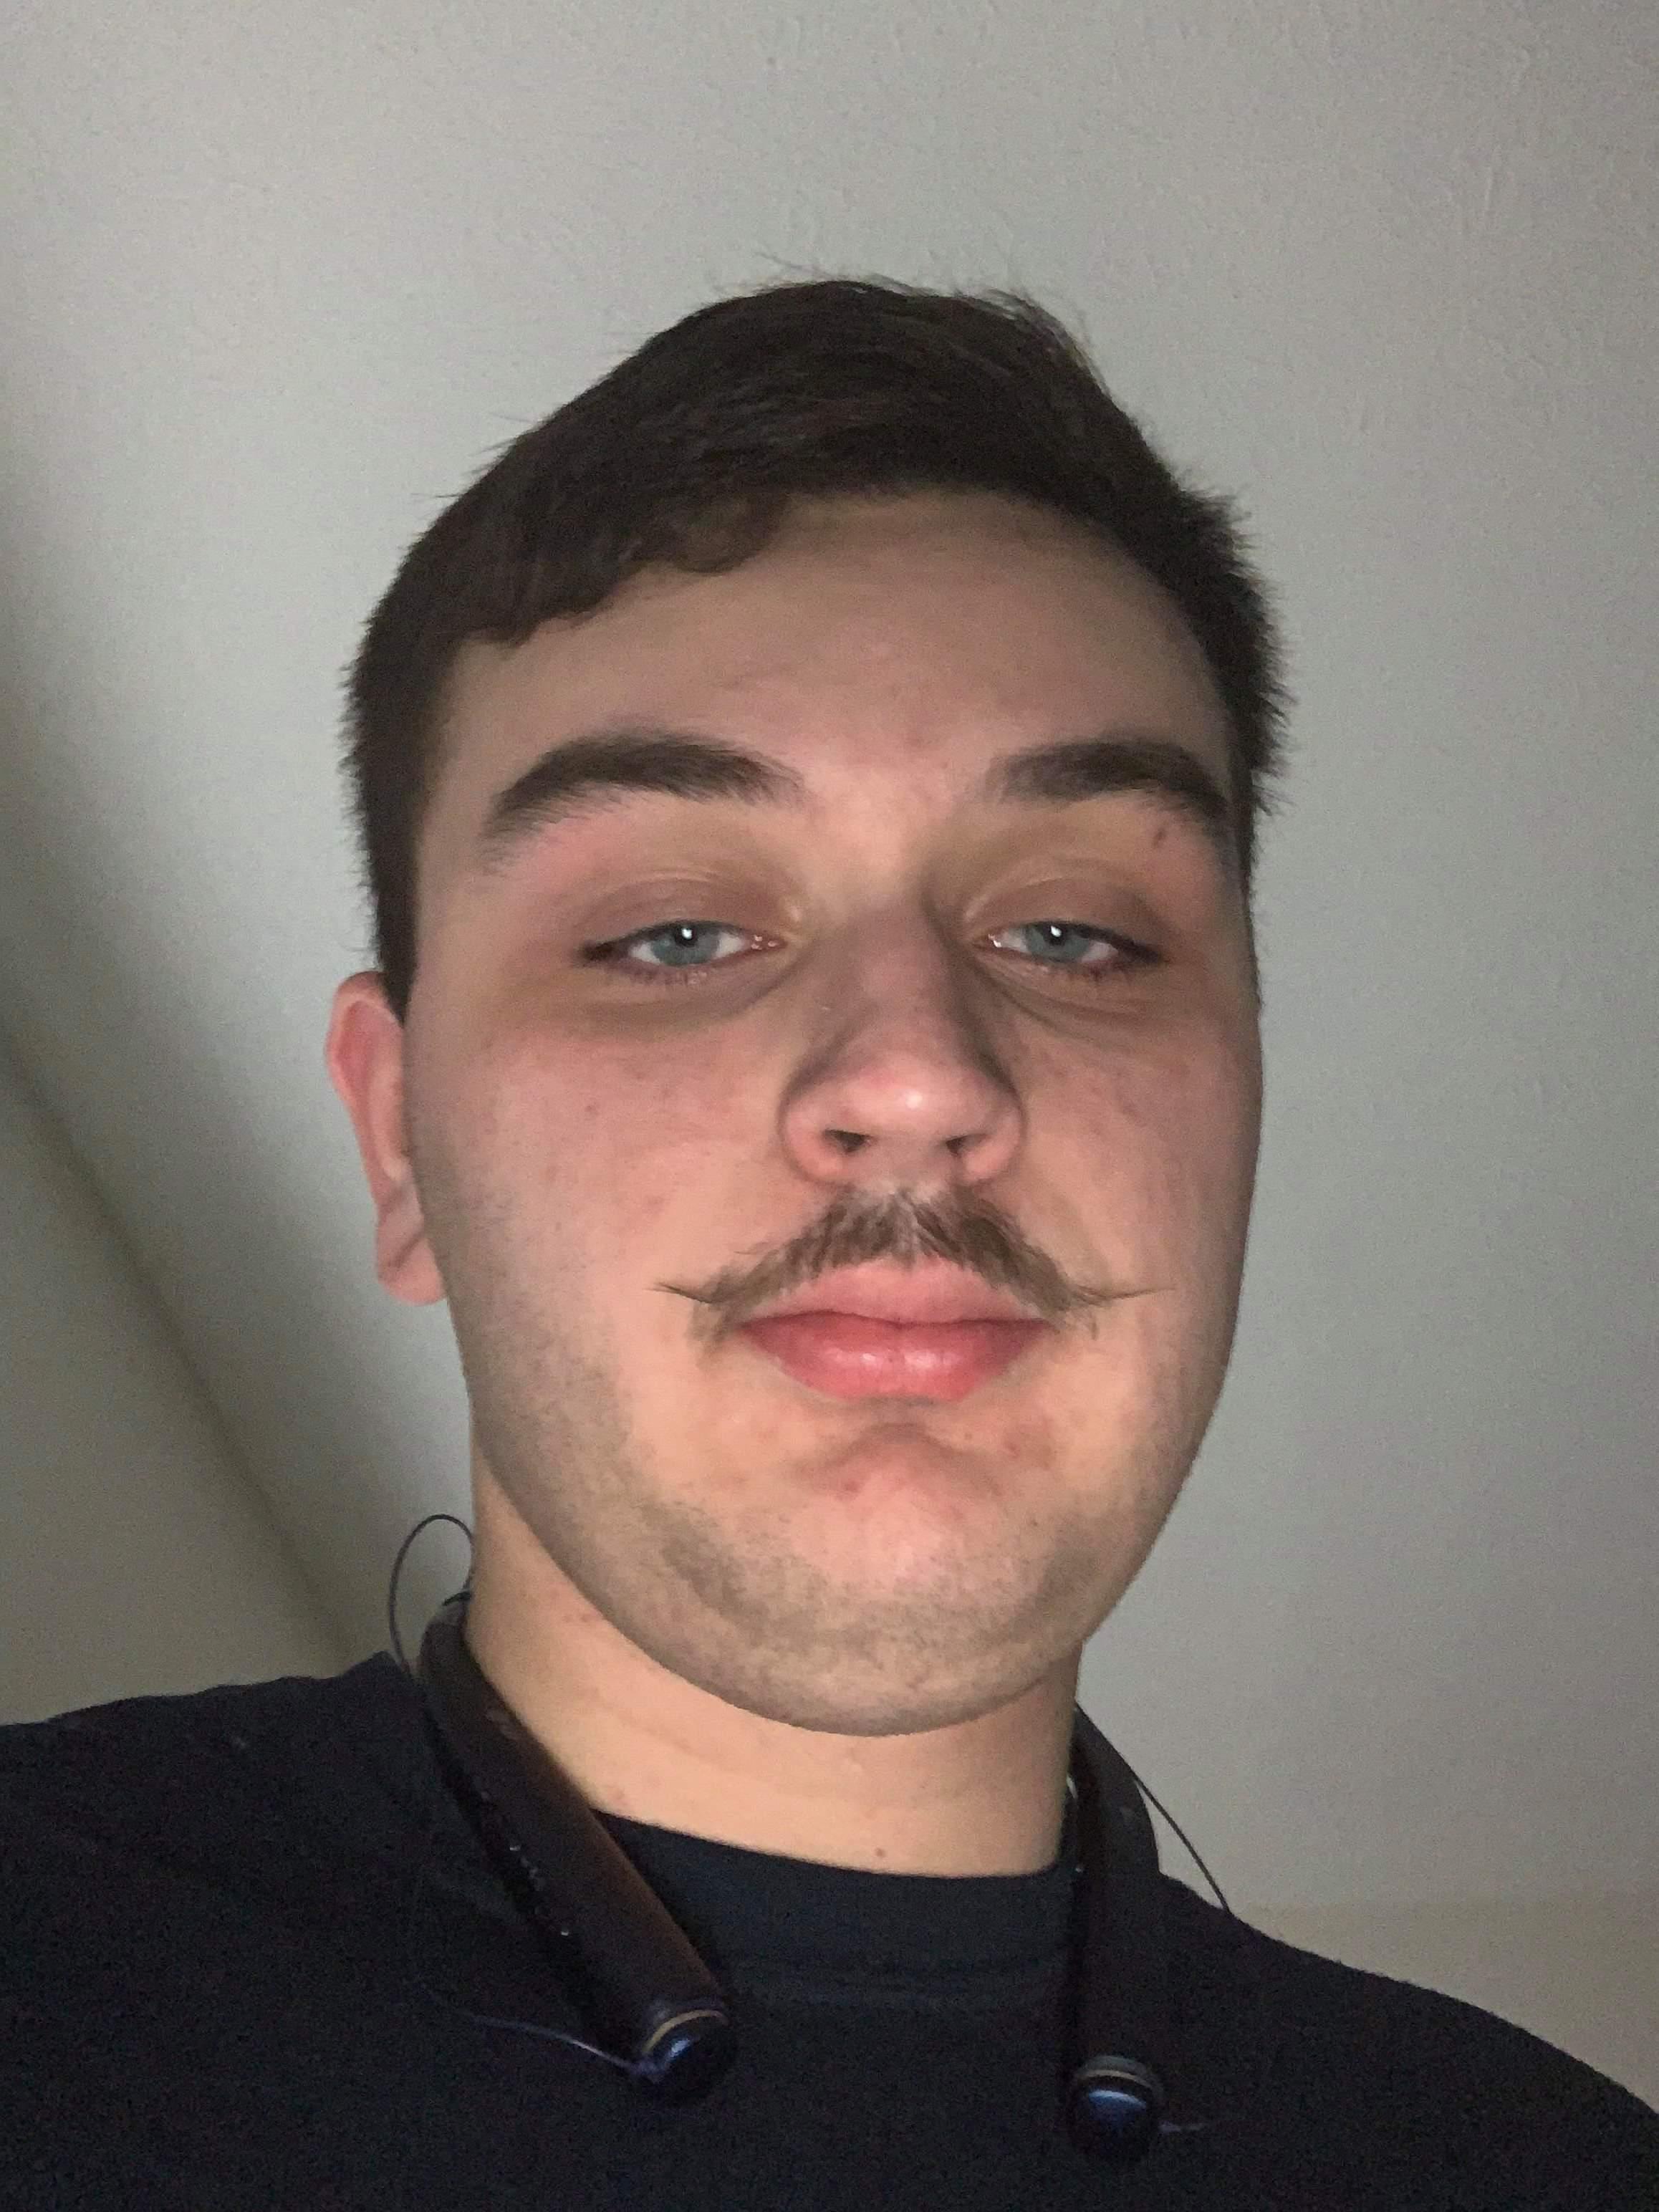 jacob.metcalf on One Bite Pizza App